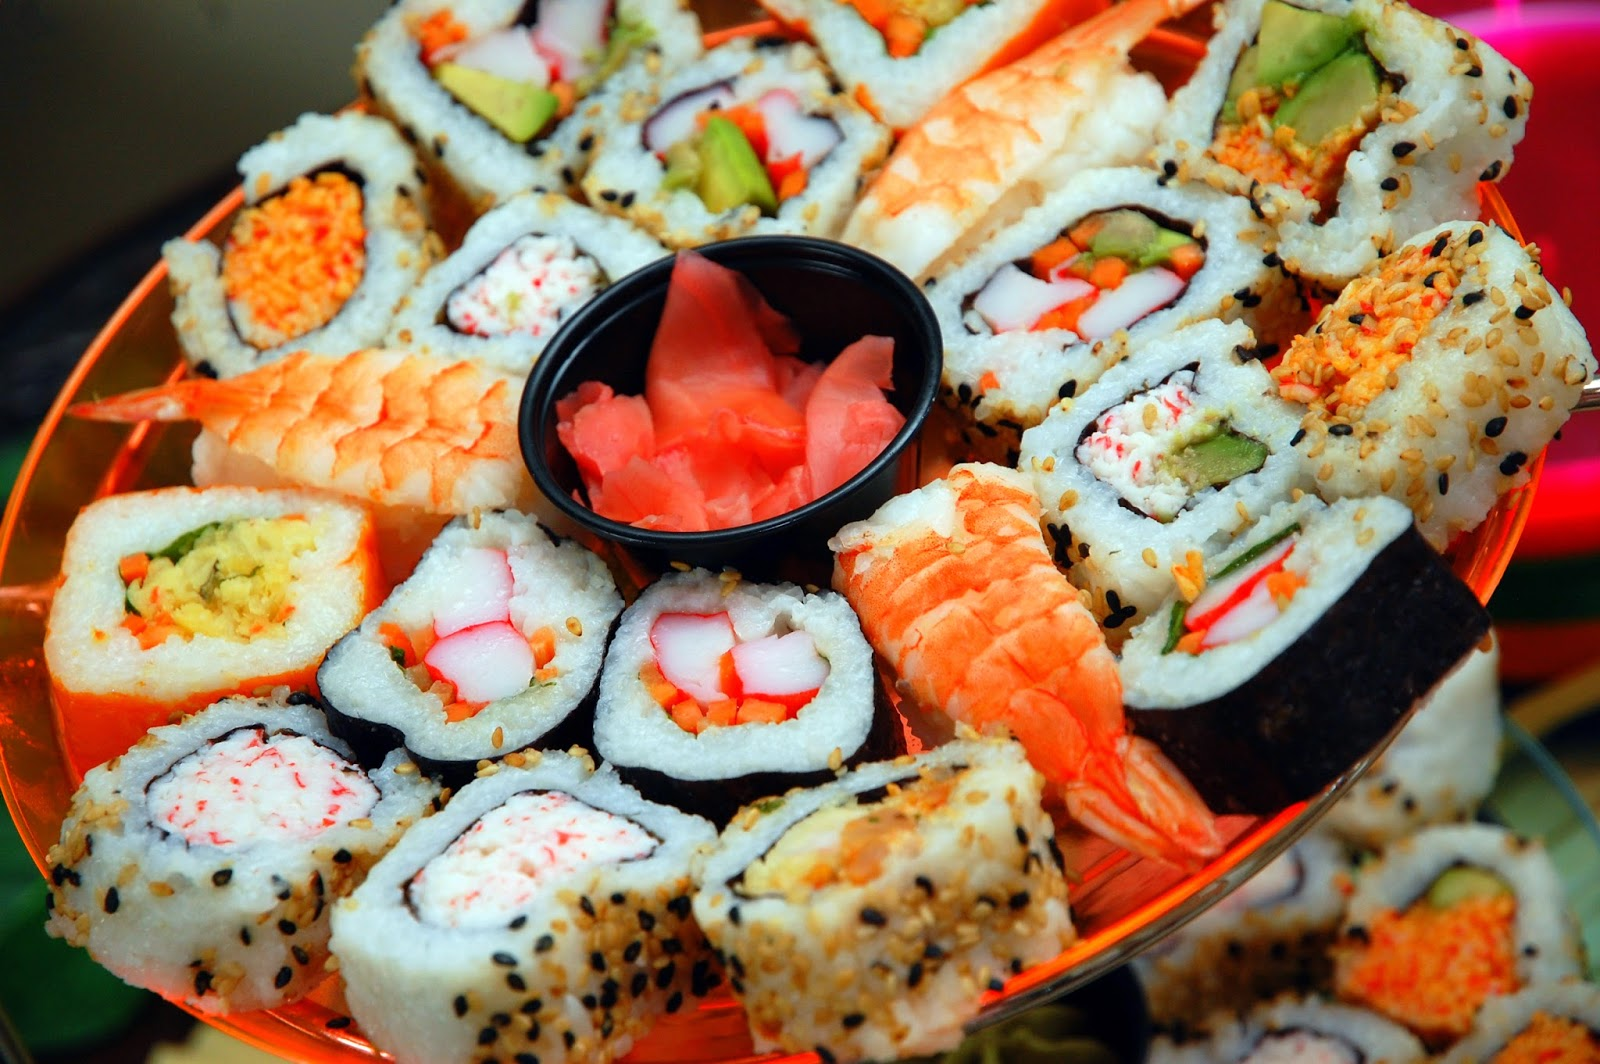 sushi adalah makan khas jepang yang banyak penggemarnya di seluruh dunia masuk 5 besar kategori makanan terenak versi cnn travel